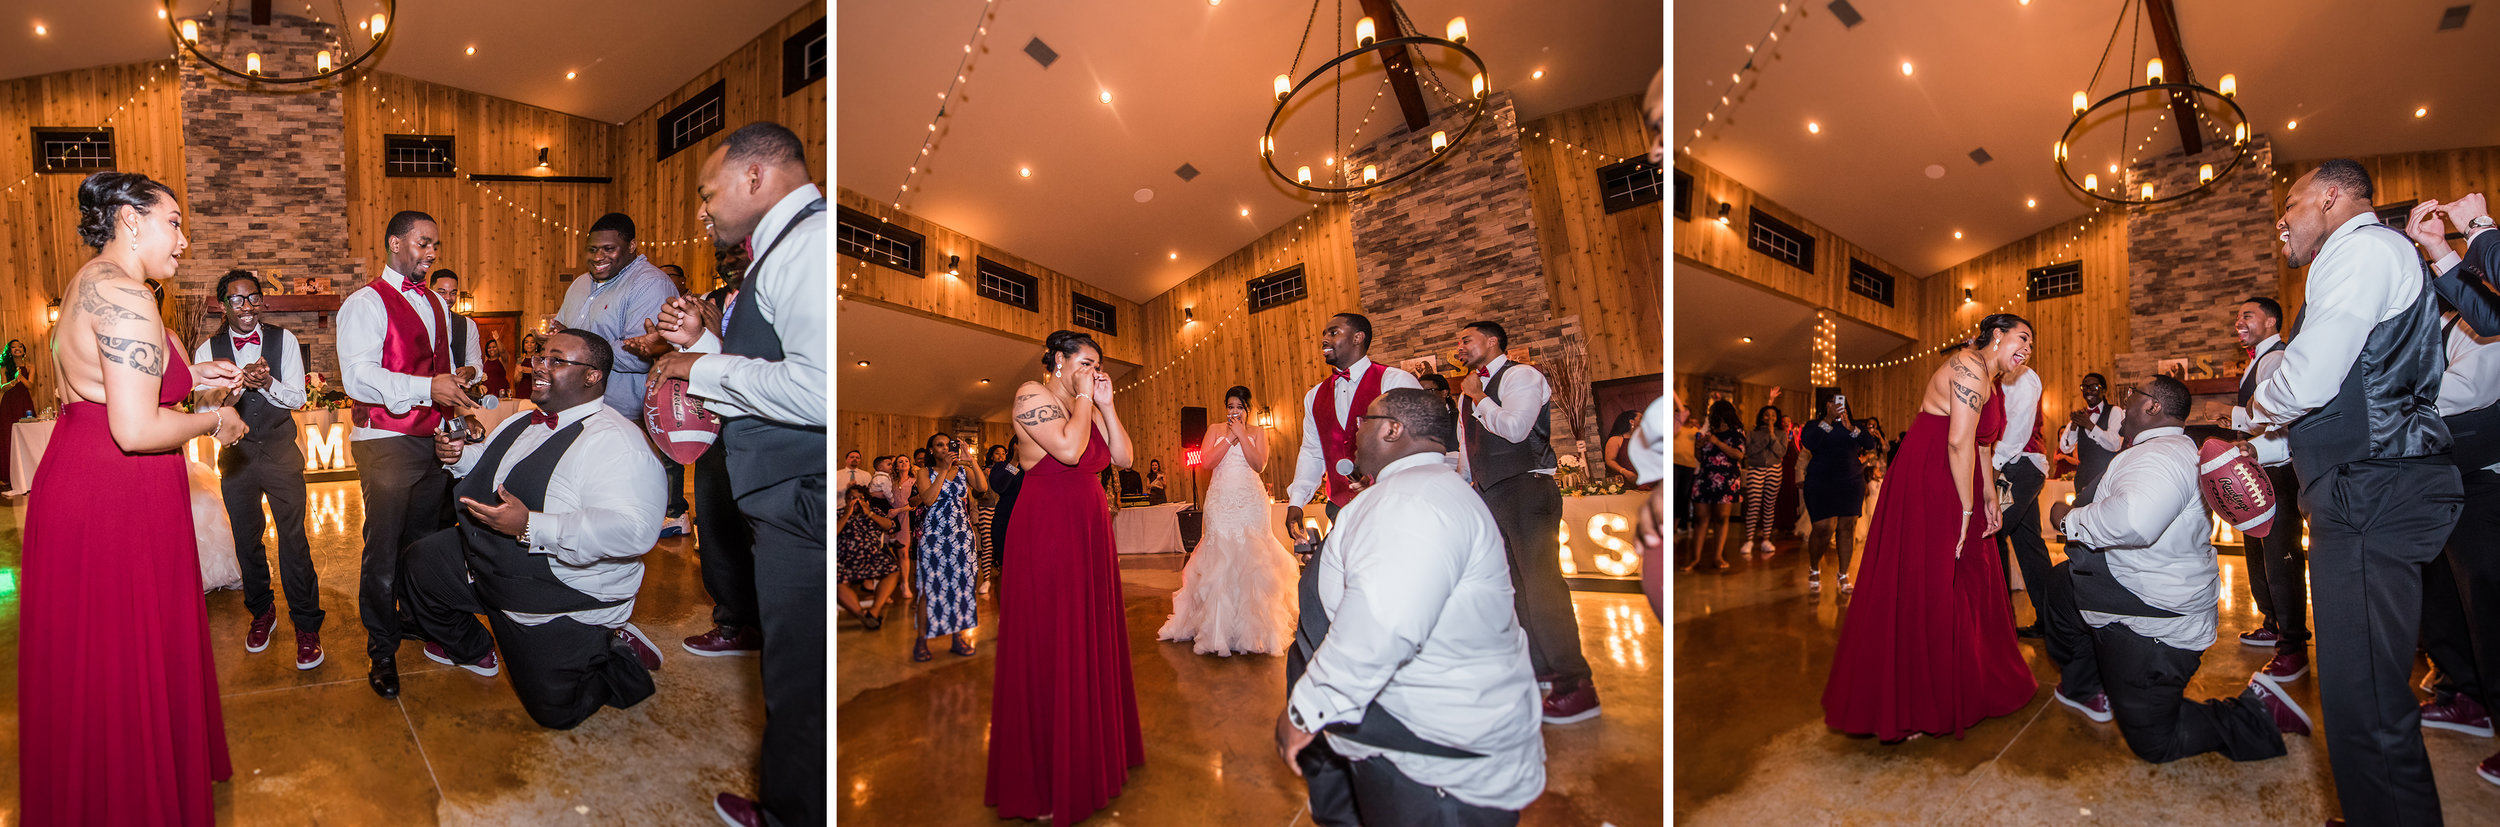 Burlington Iowa Wedding Midwest Photographer Melissa Cervantes _ Chantelle and Isaiah 36777.jpg